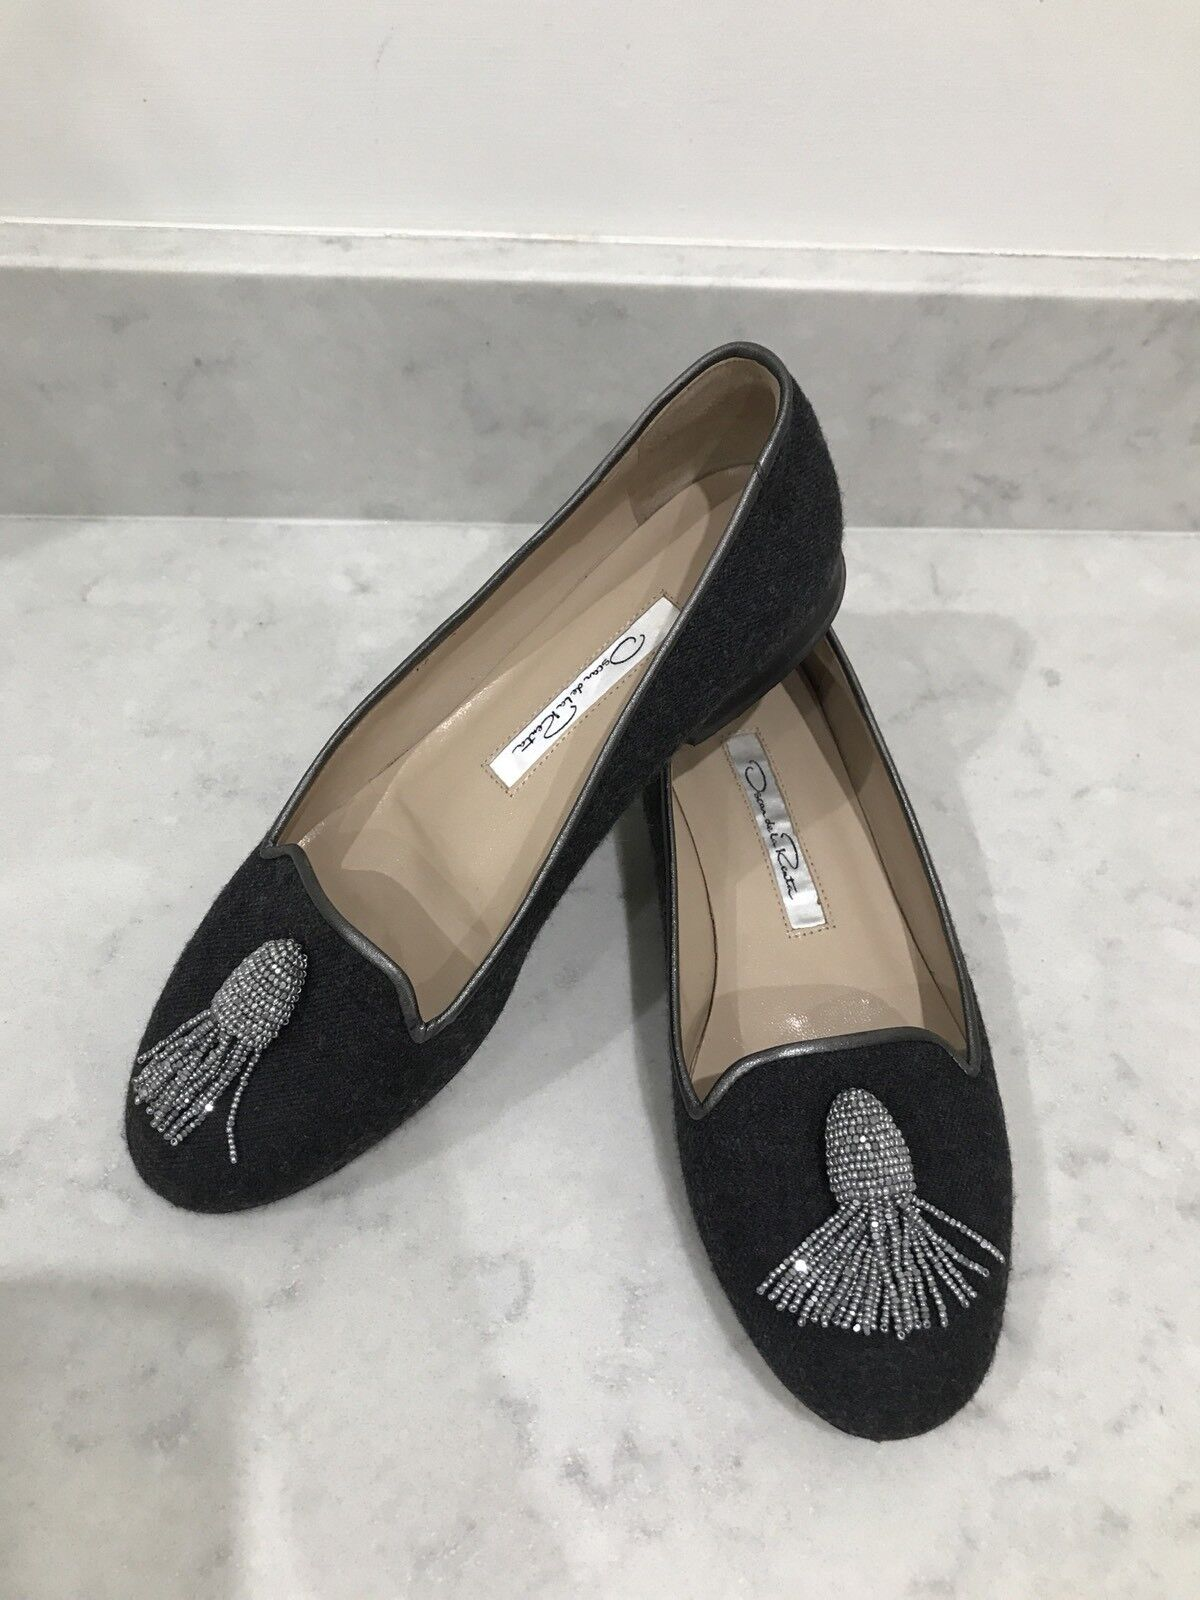 Oscar Oscar Oscar de la Renta agrémentée chaussures, taille IT37 UK4 504cda